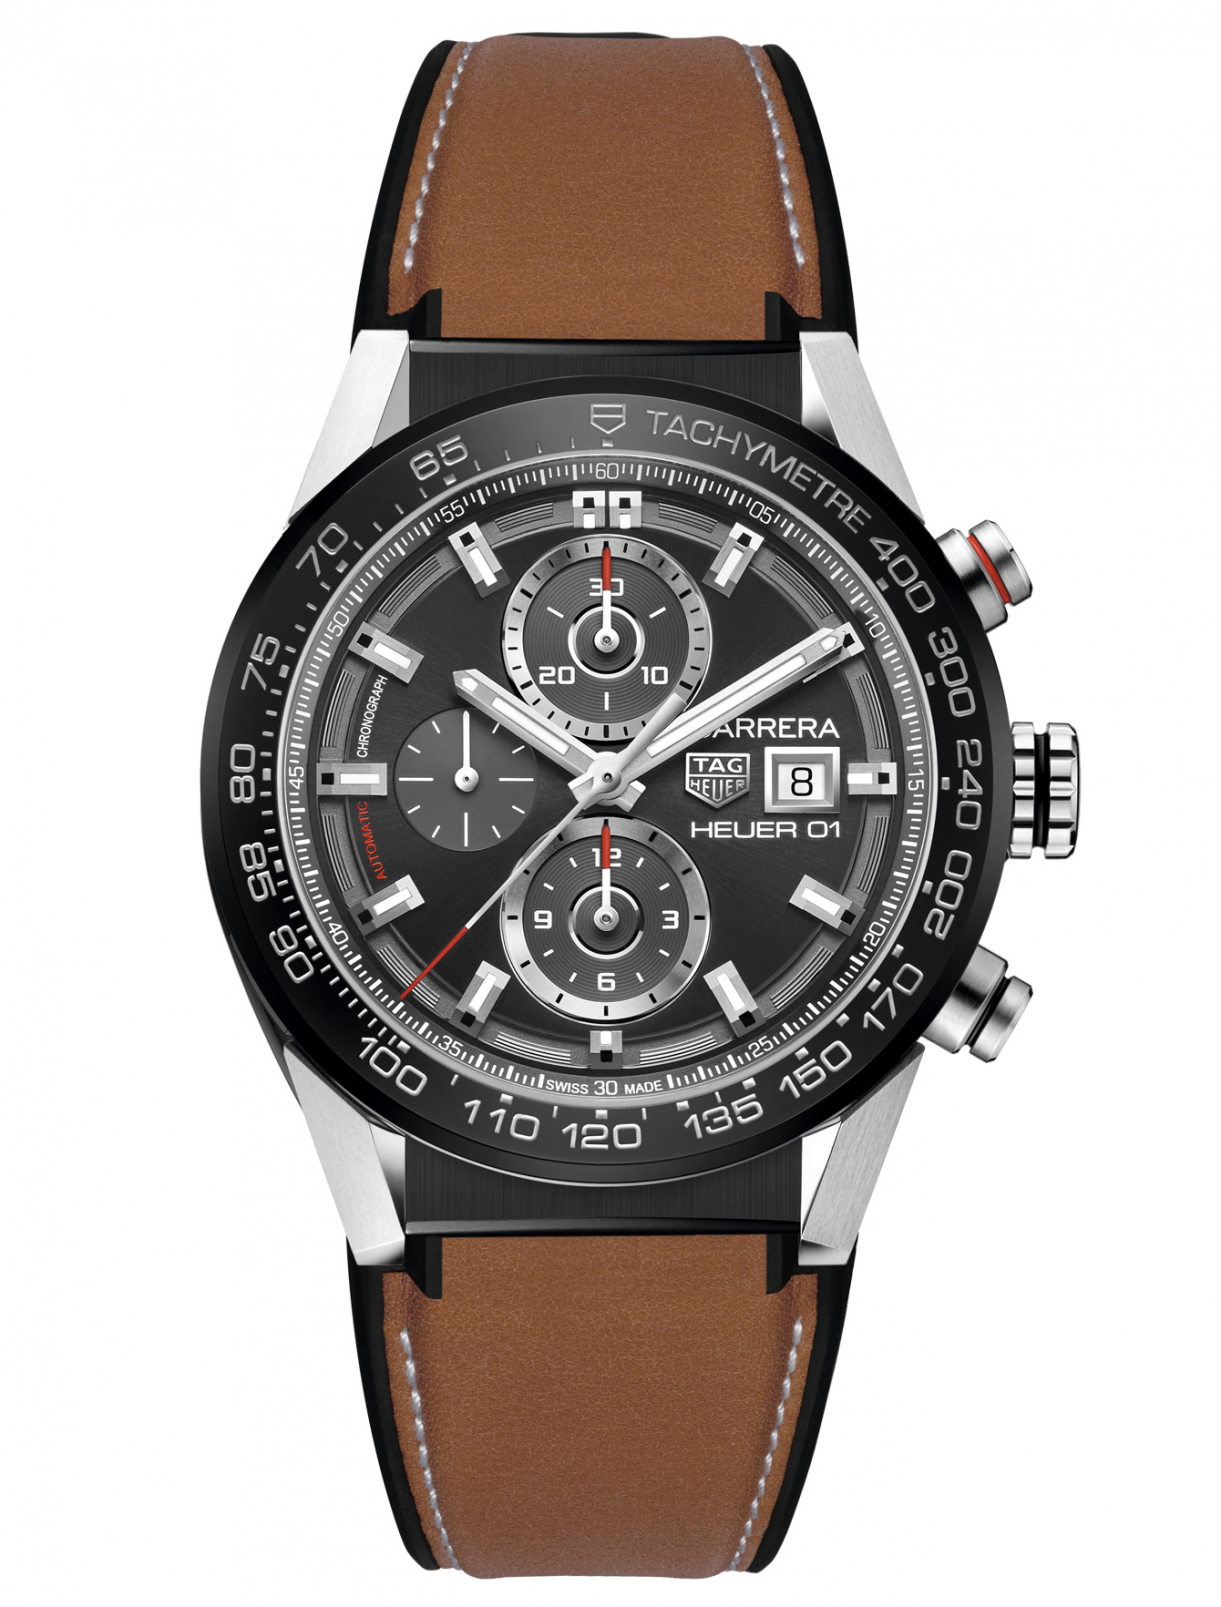 Часы CAR201W.FT6122 Carrera TAG Heuer  –  Общий вид